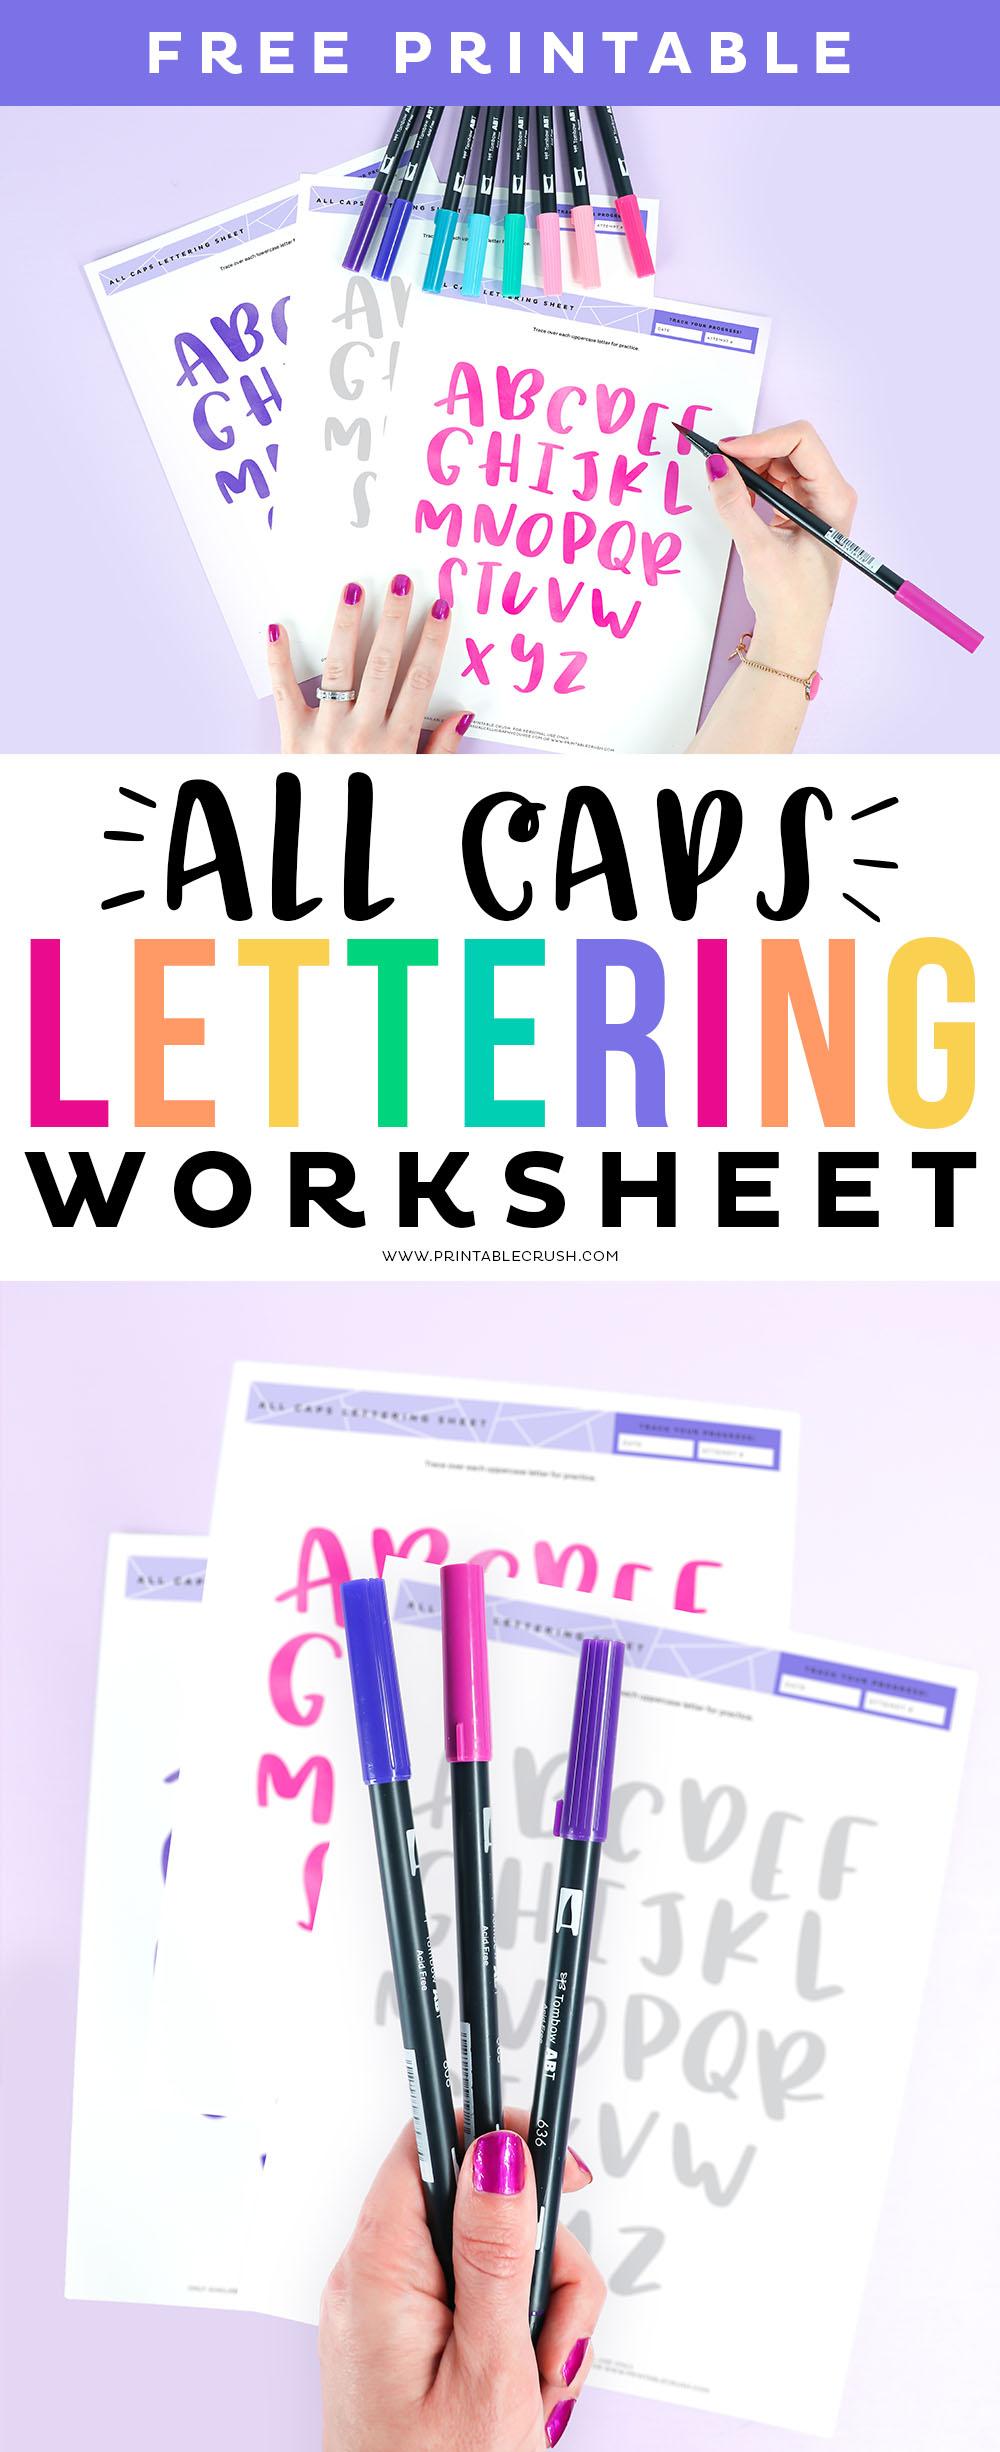 All Caps Lettering Worksheets - All Caps print lettering - lettering practice sheets - brush lettering - Tombow dual brush pens - Printable Crush